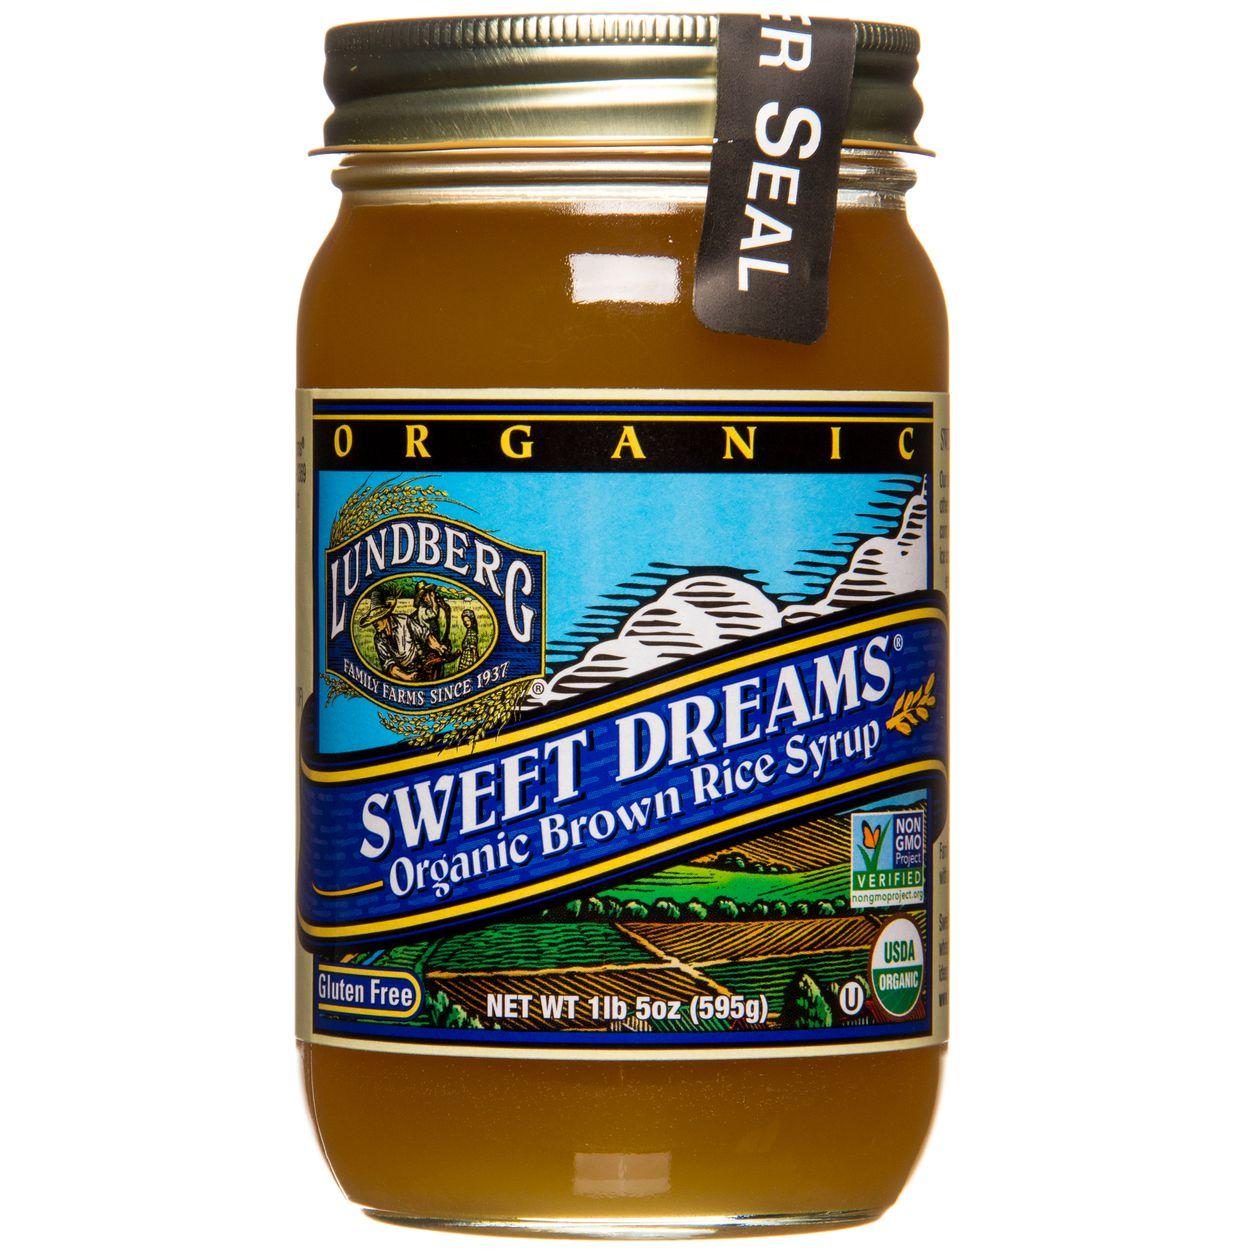 Lundberg Brown Rice Syrup Organic Gluten Free Azure Standard